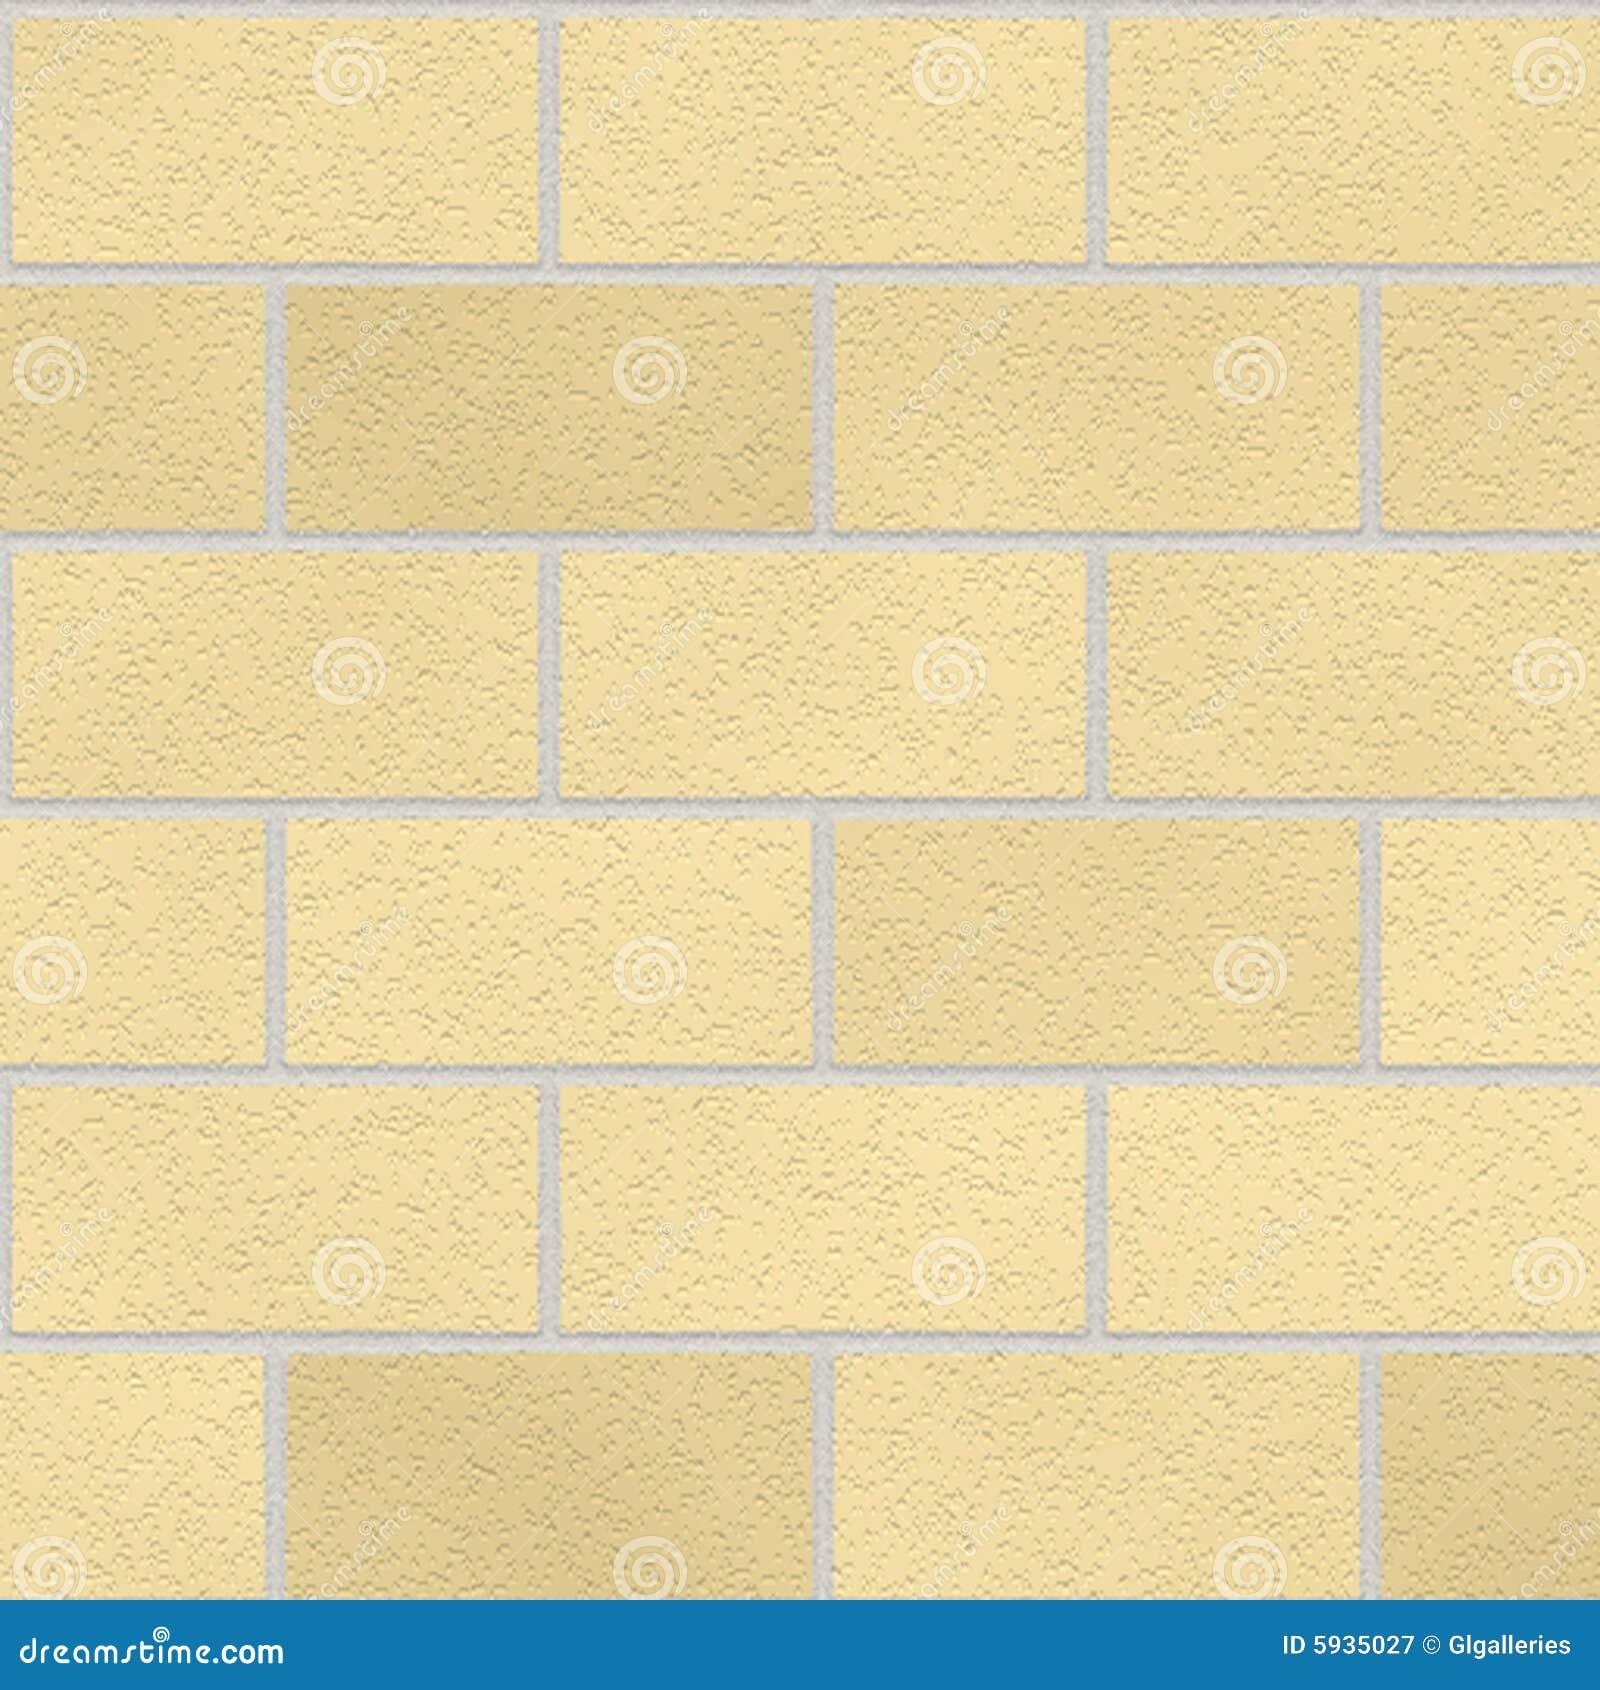 Seamless cream bricks stock illustration. Illustration of wall - 5935027